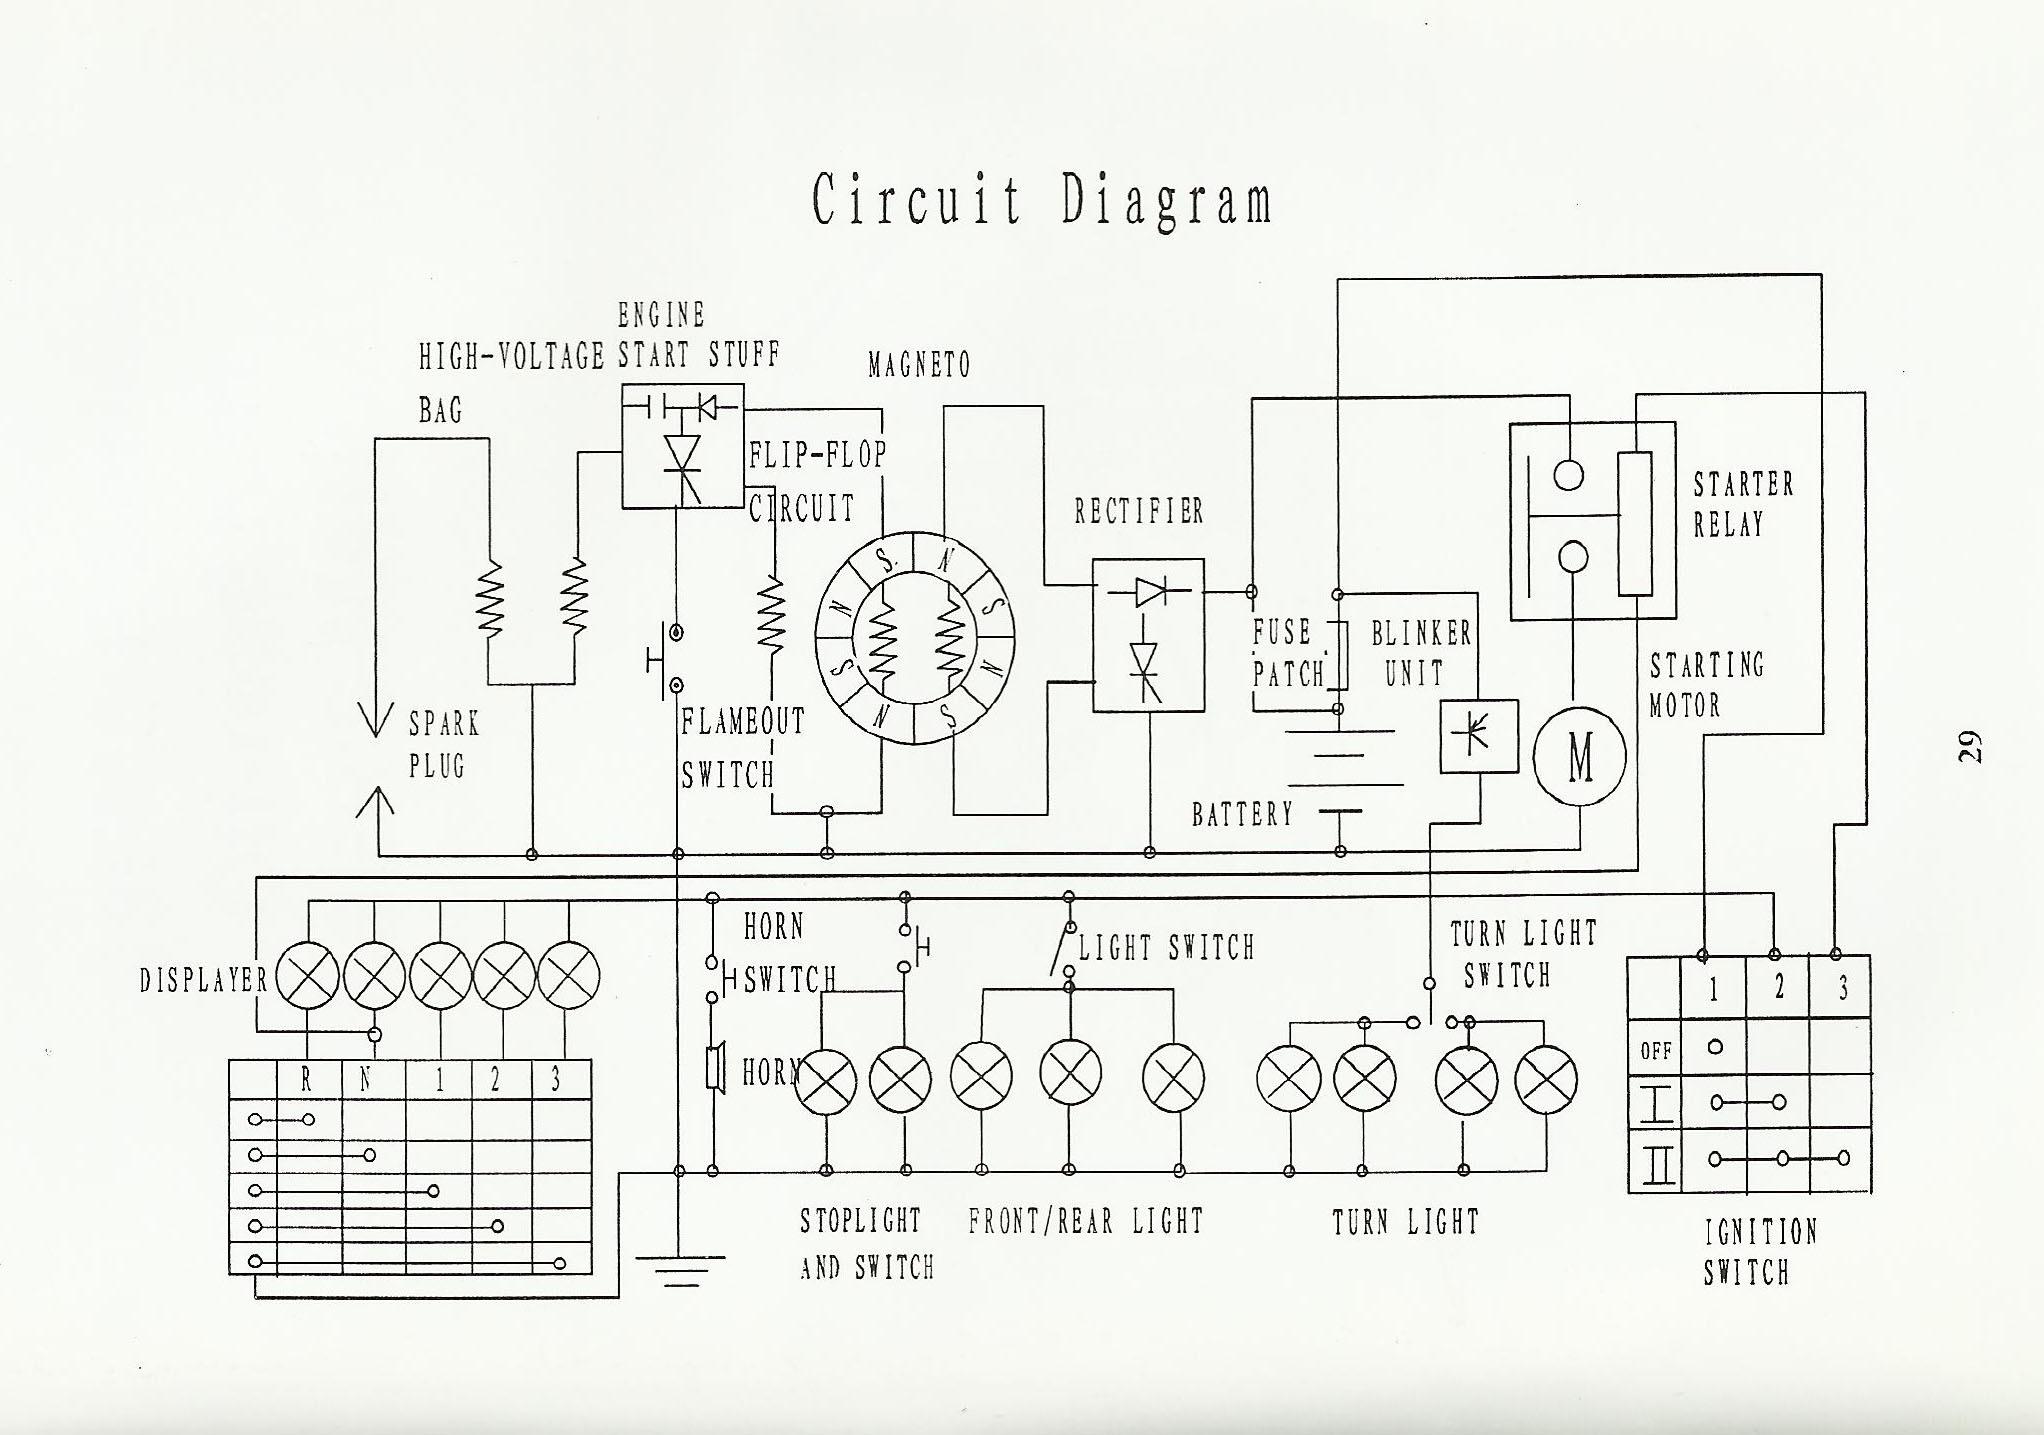 Manco Go Kart Parts Diagram